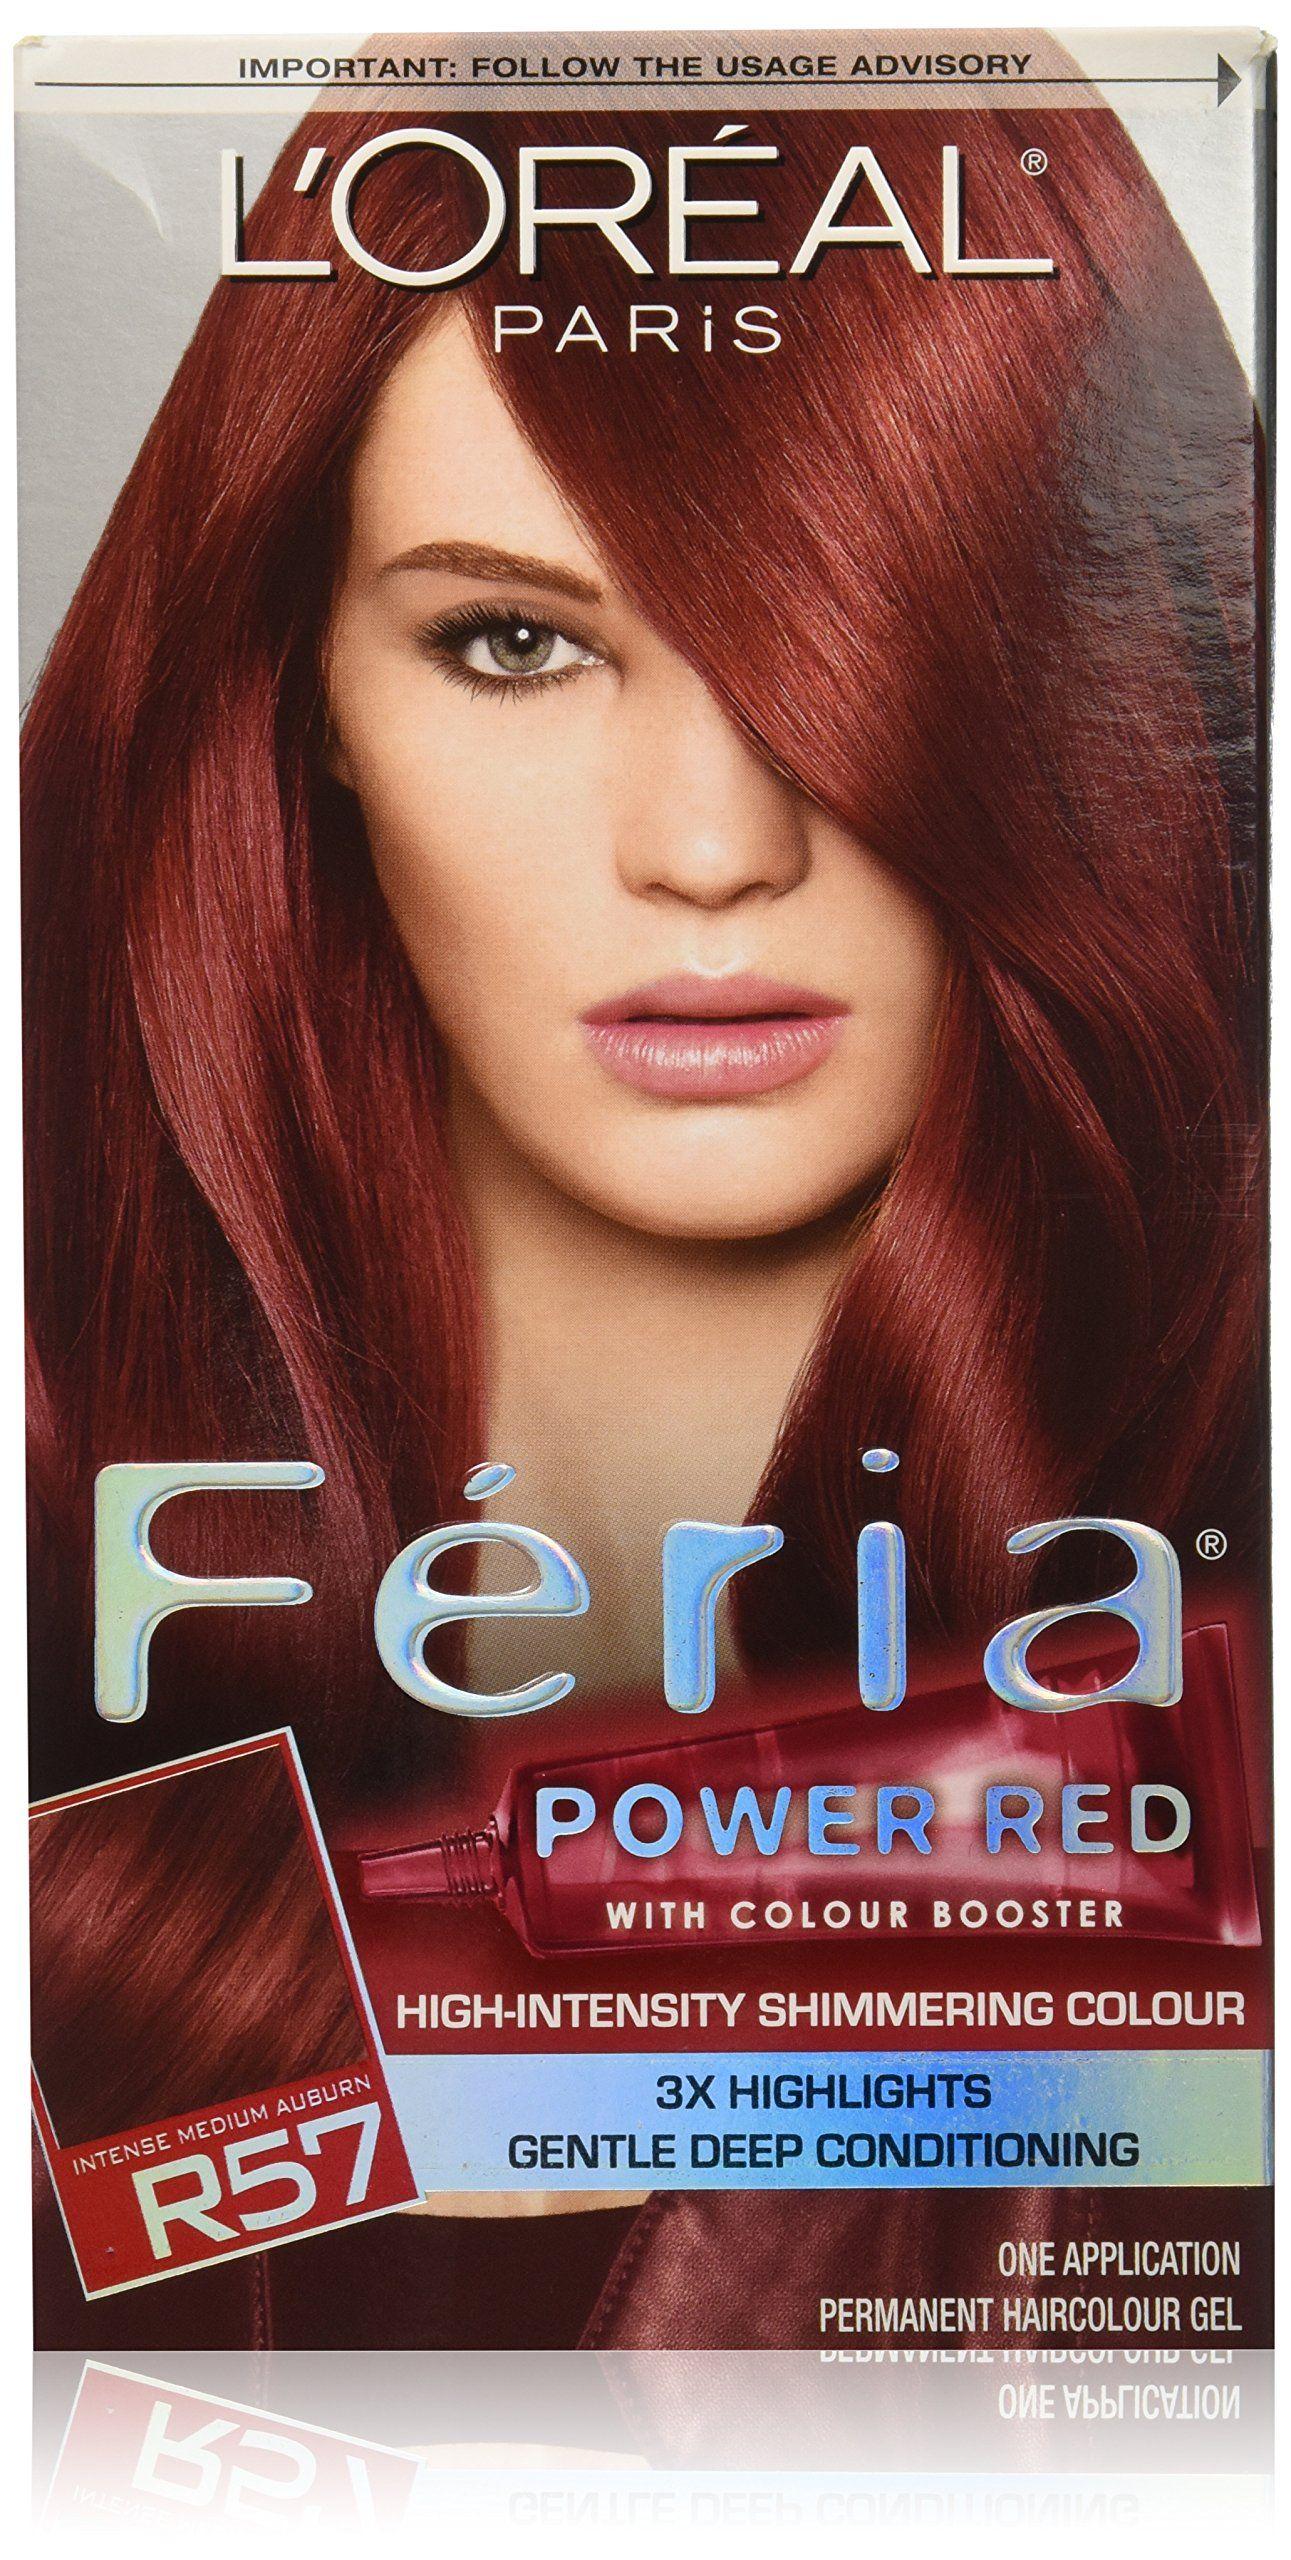 L Oreal Feria Reds Hair Color R57 Intense Medium Auburn Cherry Crush